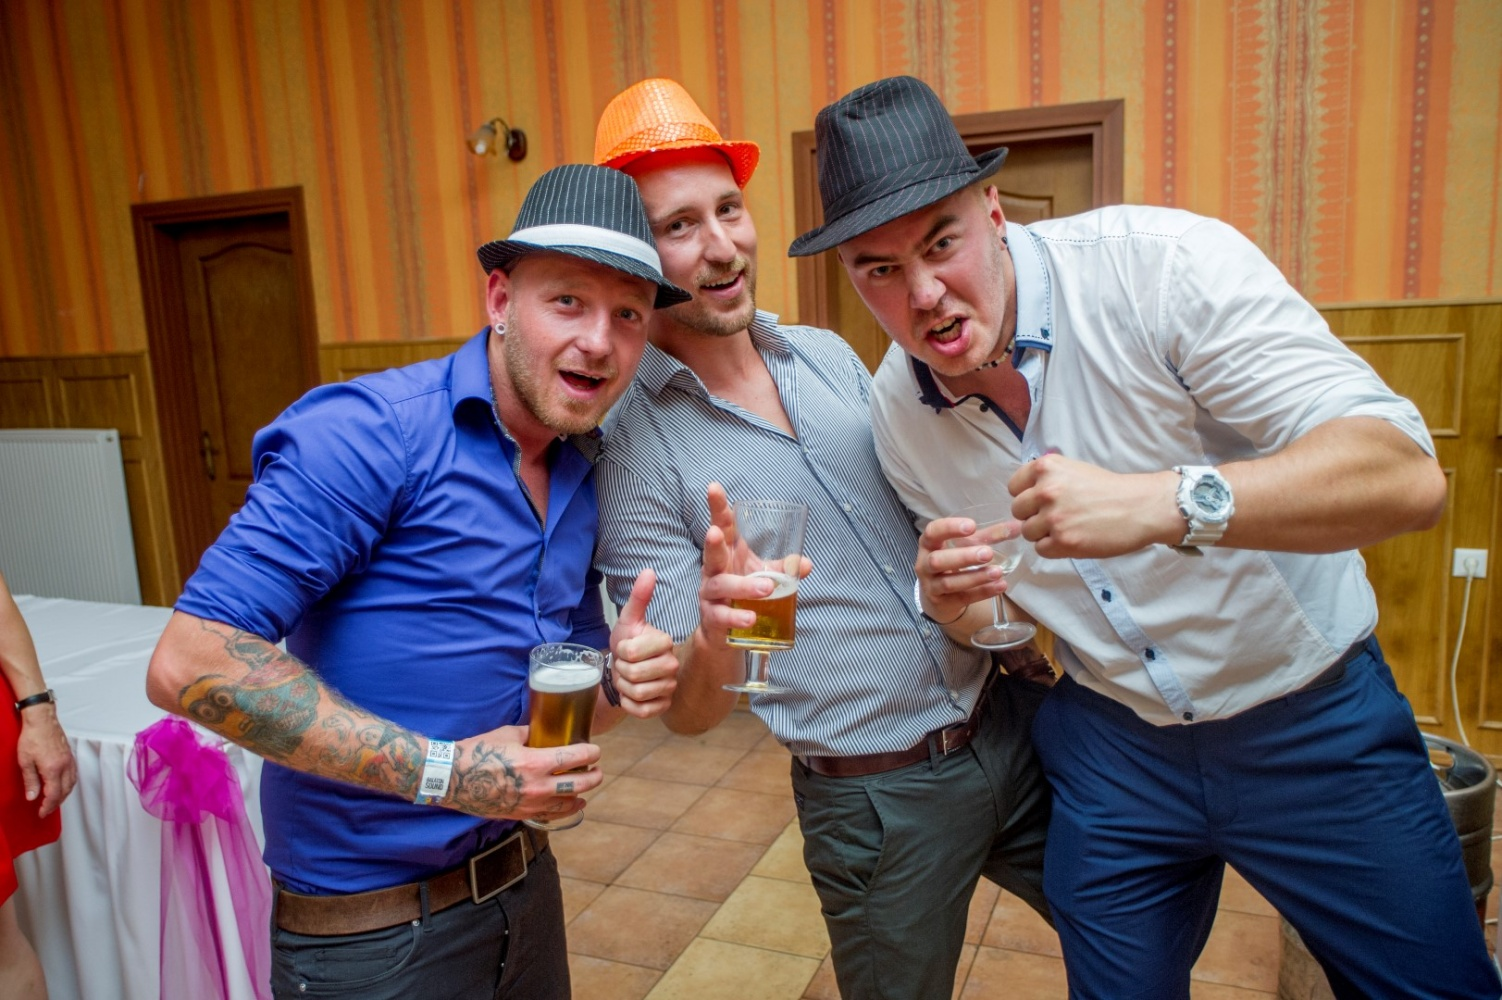 http://www.fotoz.sk/images/gallery-29/normal/eskuvo_vintop-karko_233.jpg